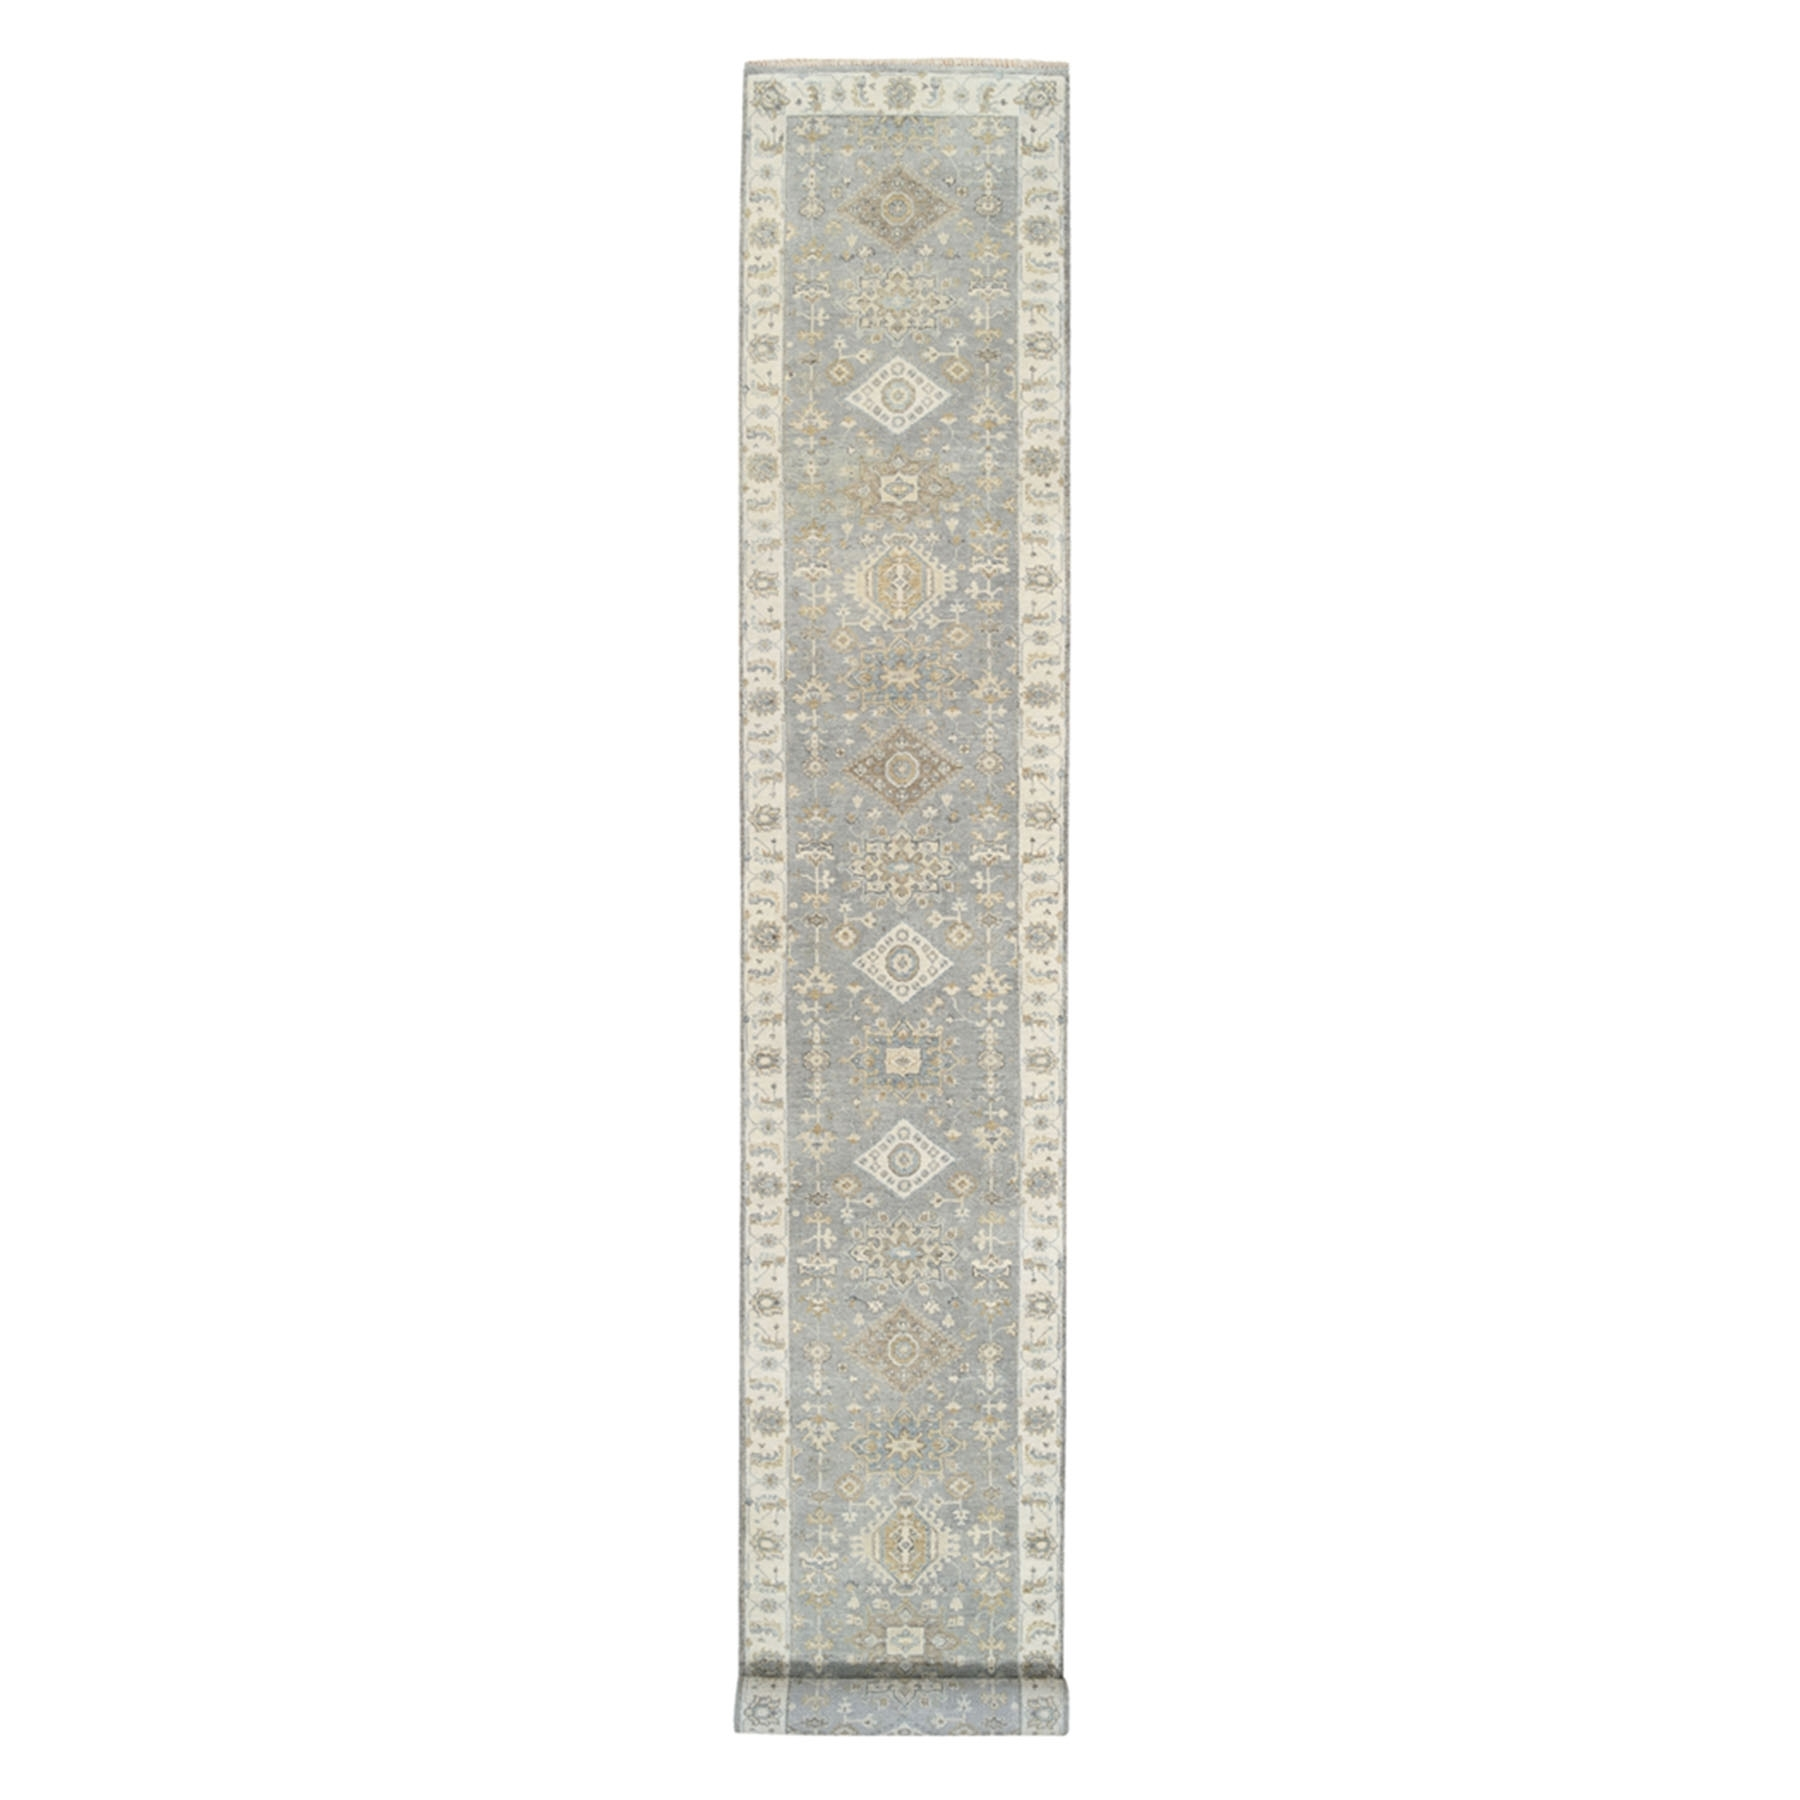 Serapi Heriz and Bakhshayesh Collection Hand Knotted Grey Rug No: 1125290